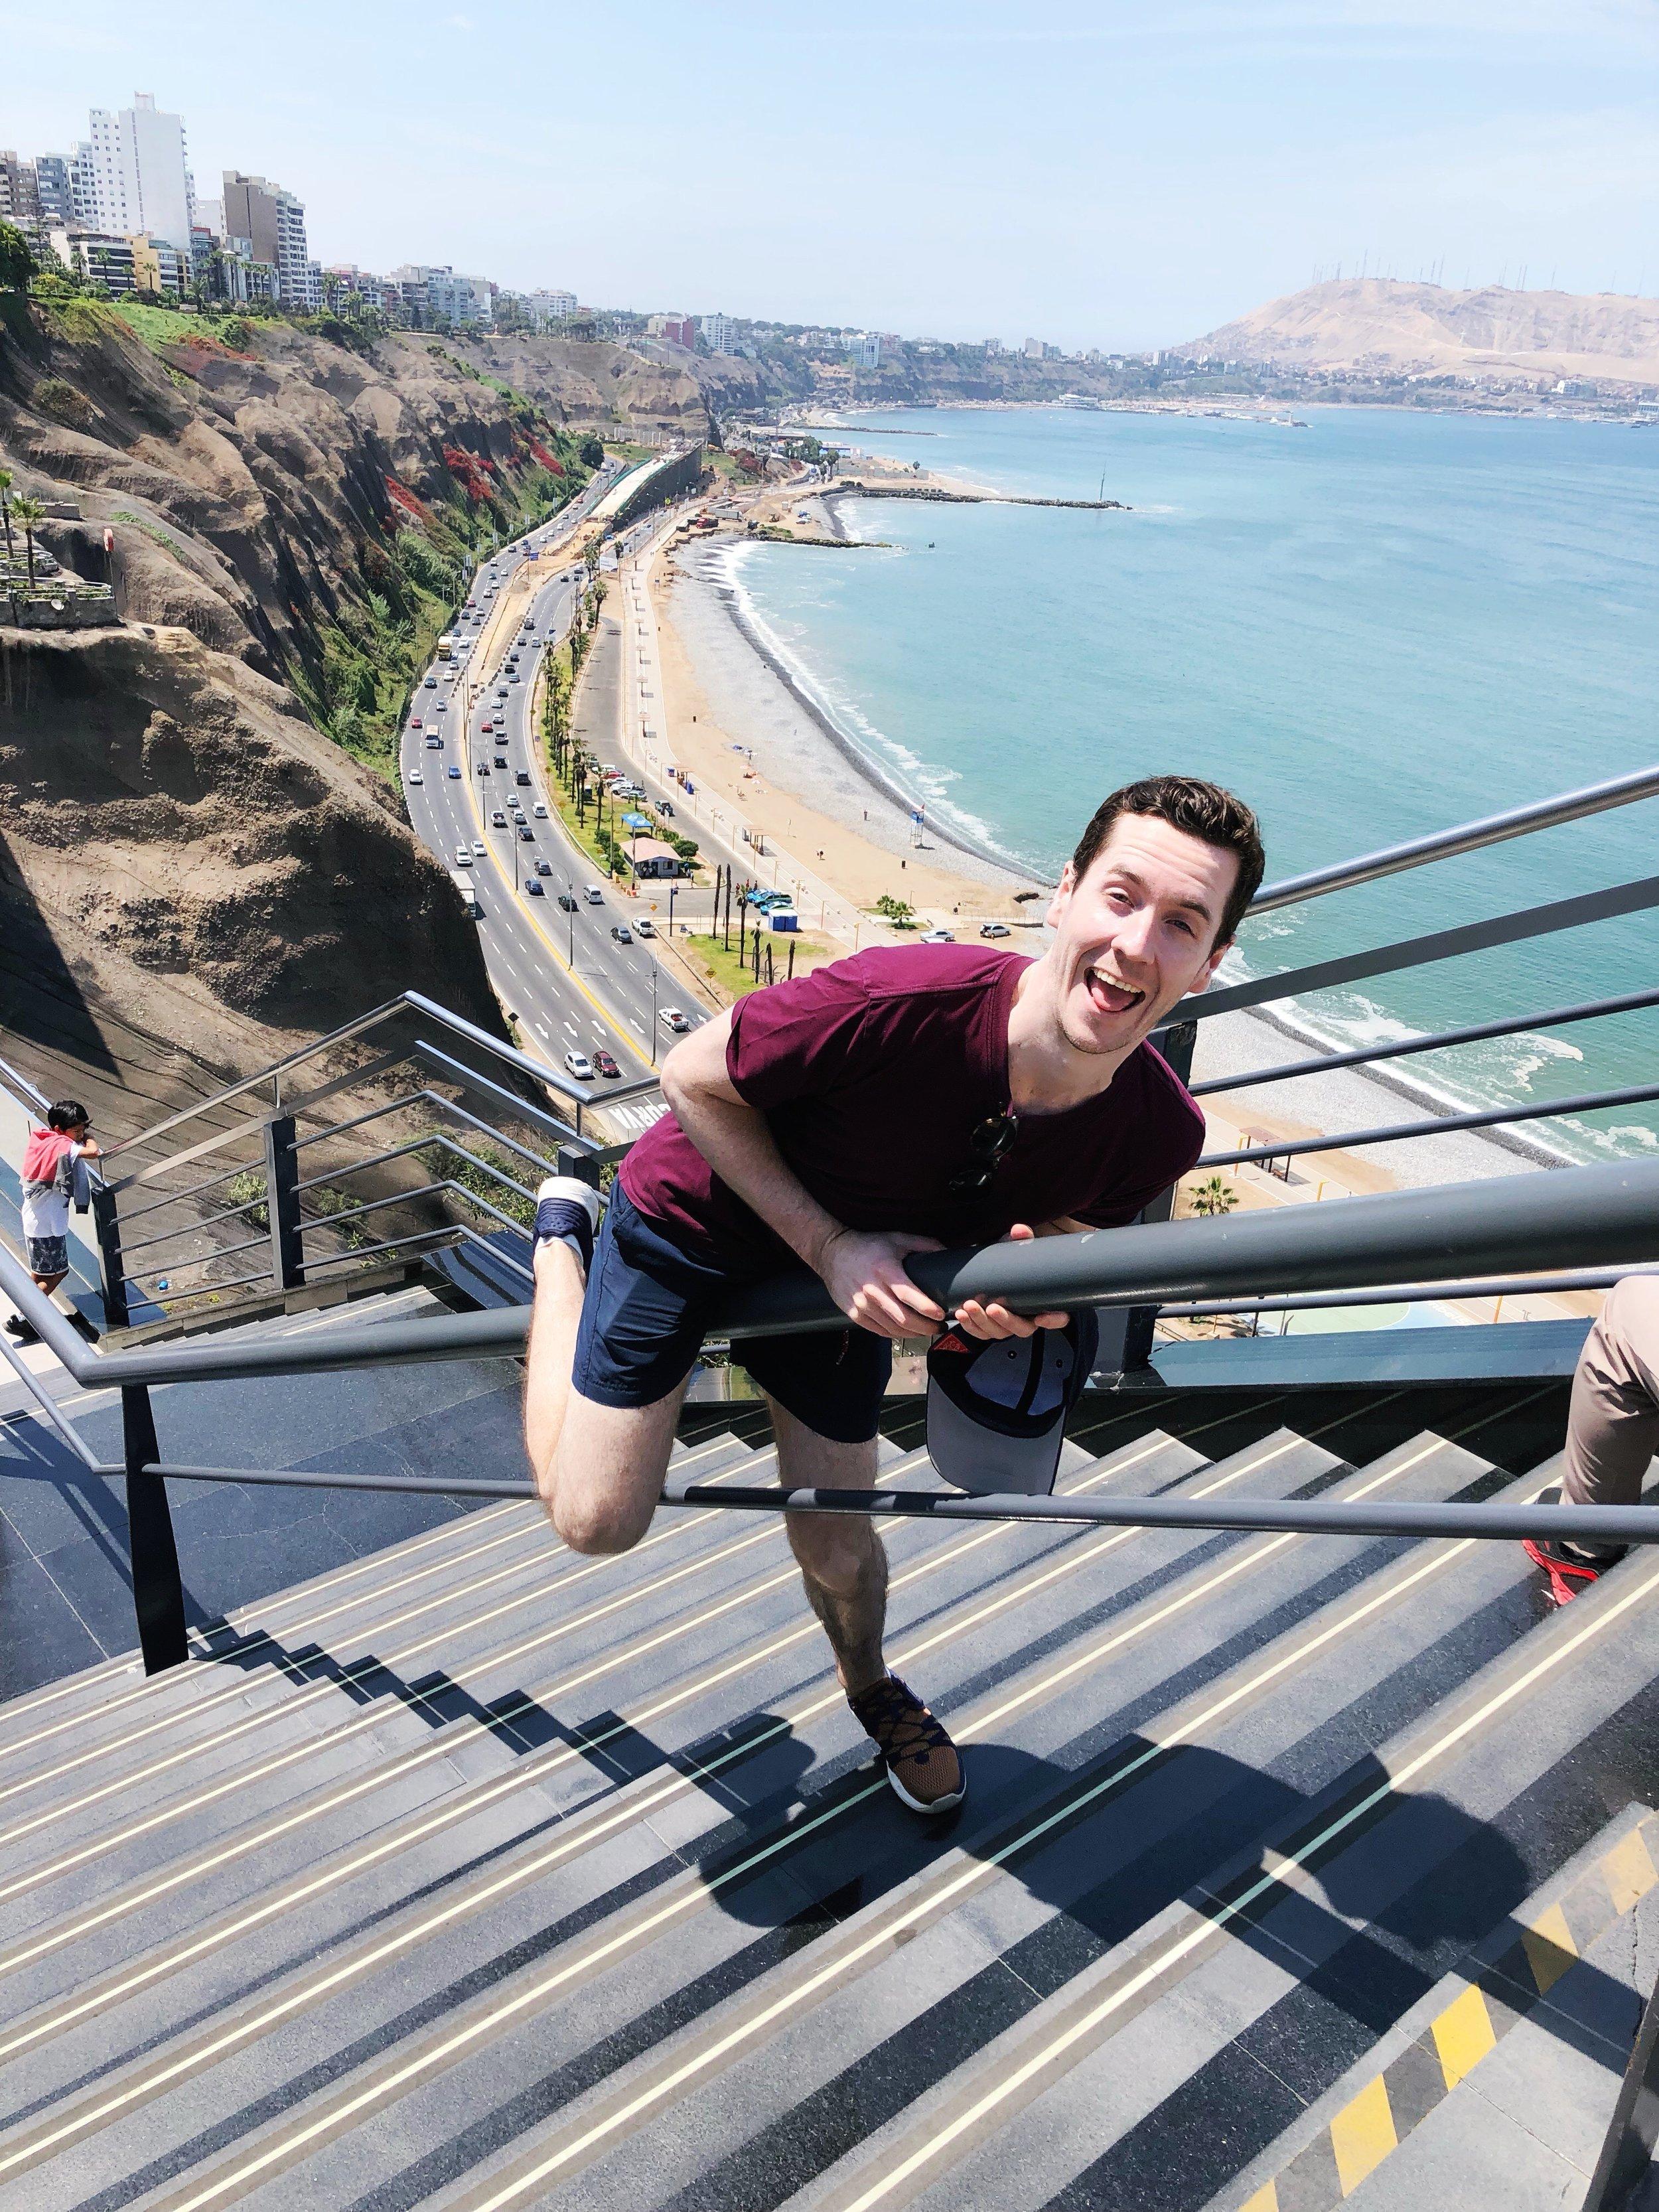 Miraflores-malecon boardwalk - lima - peru  - travel tips - south america